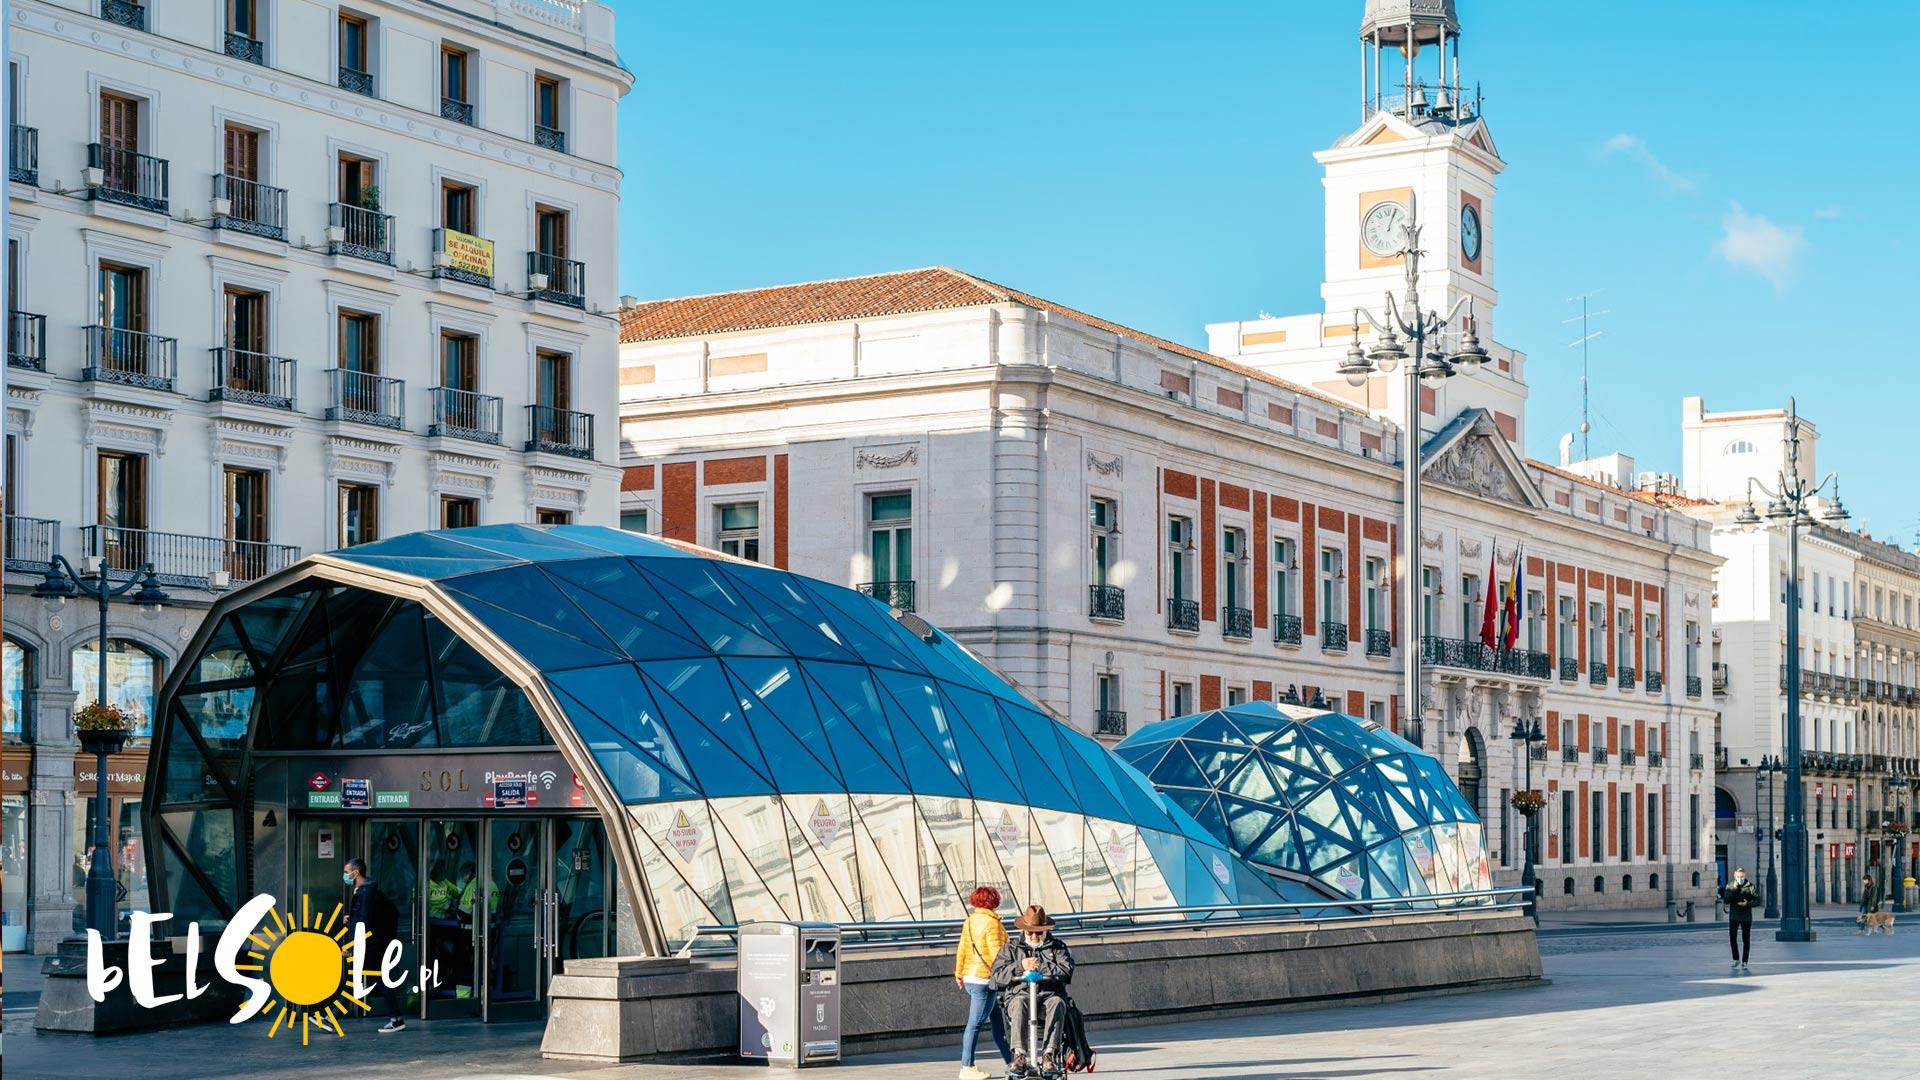 Puerta del Sol Madryt